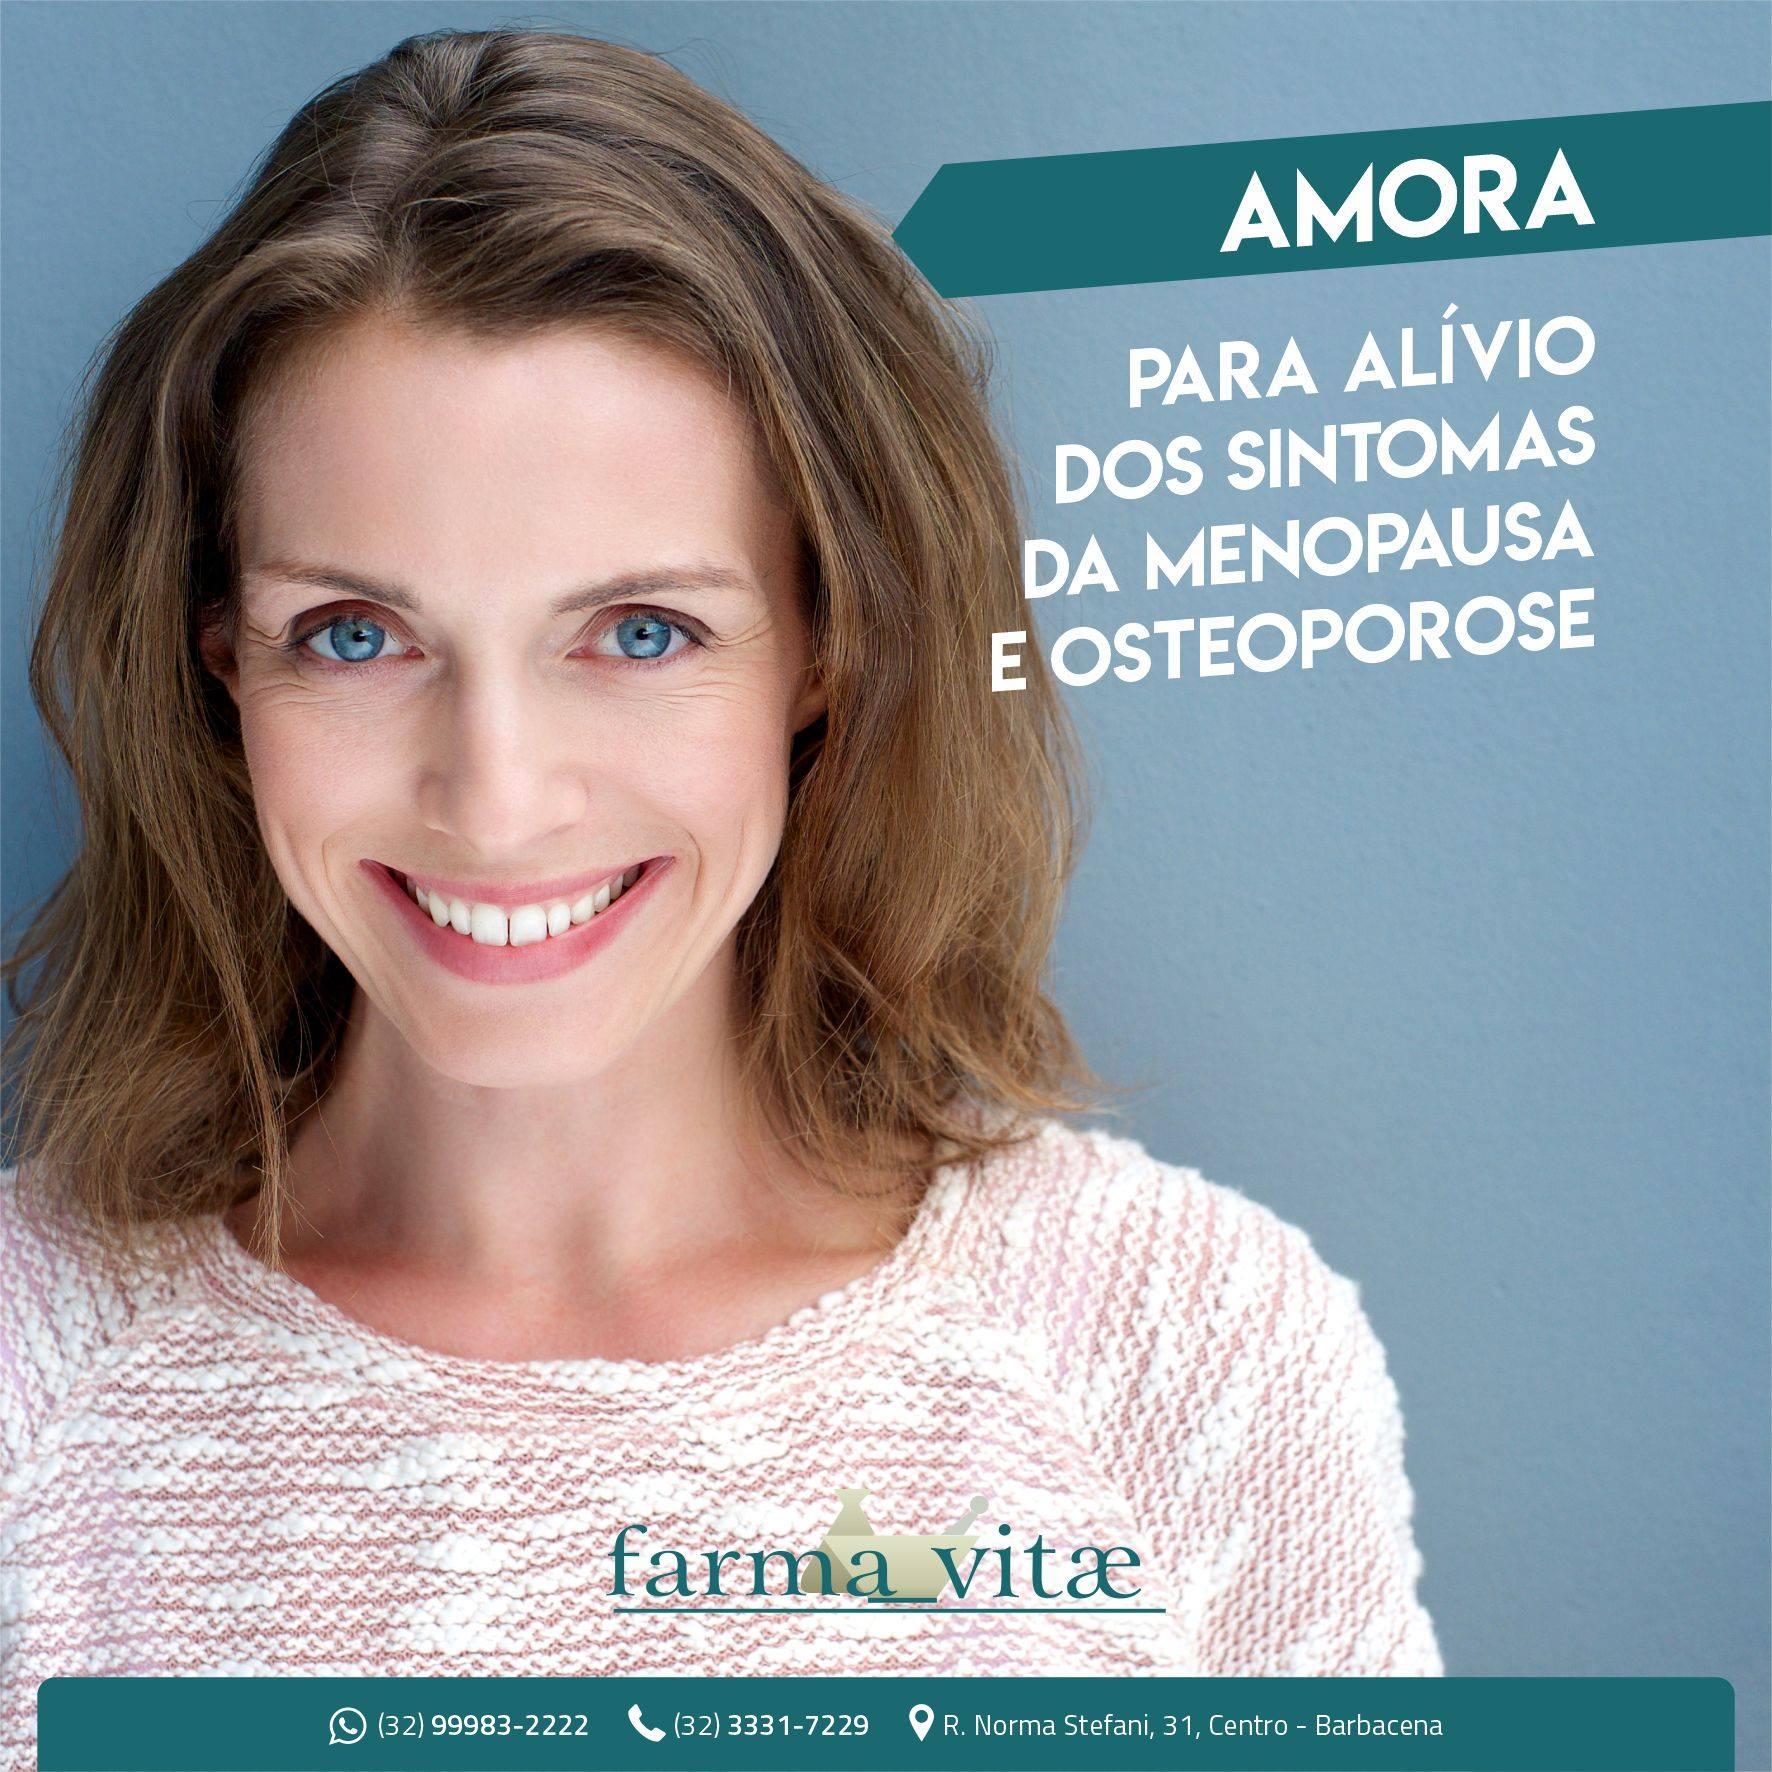 001 Farmavitae Amora